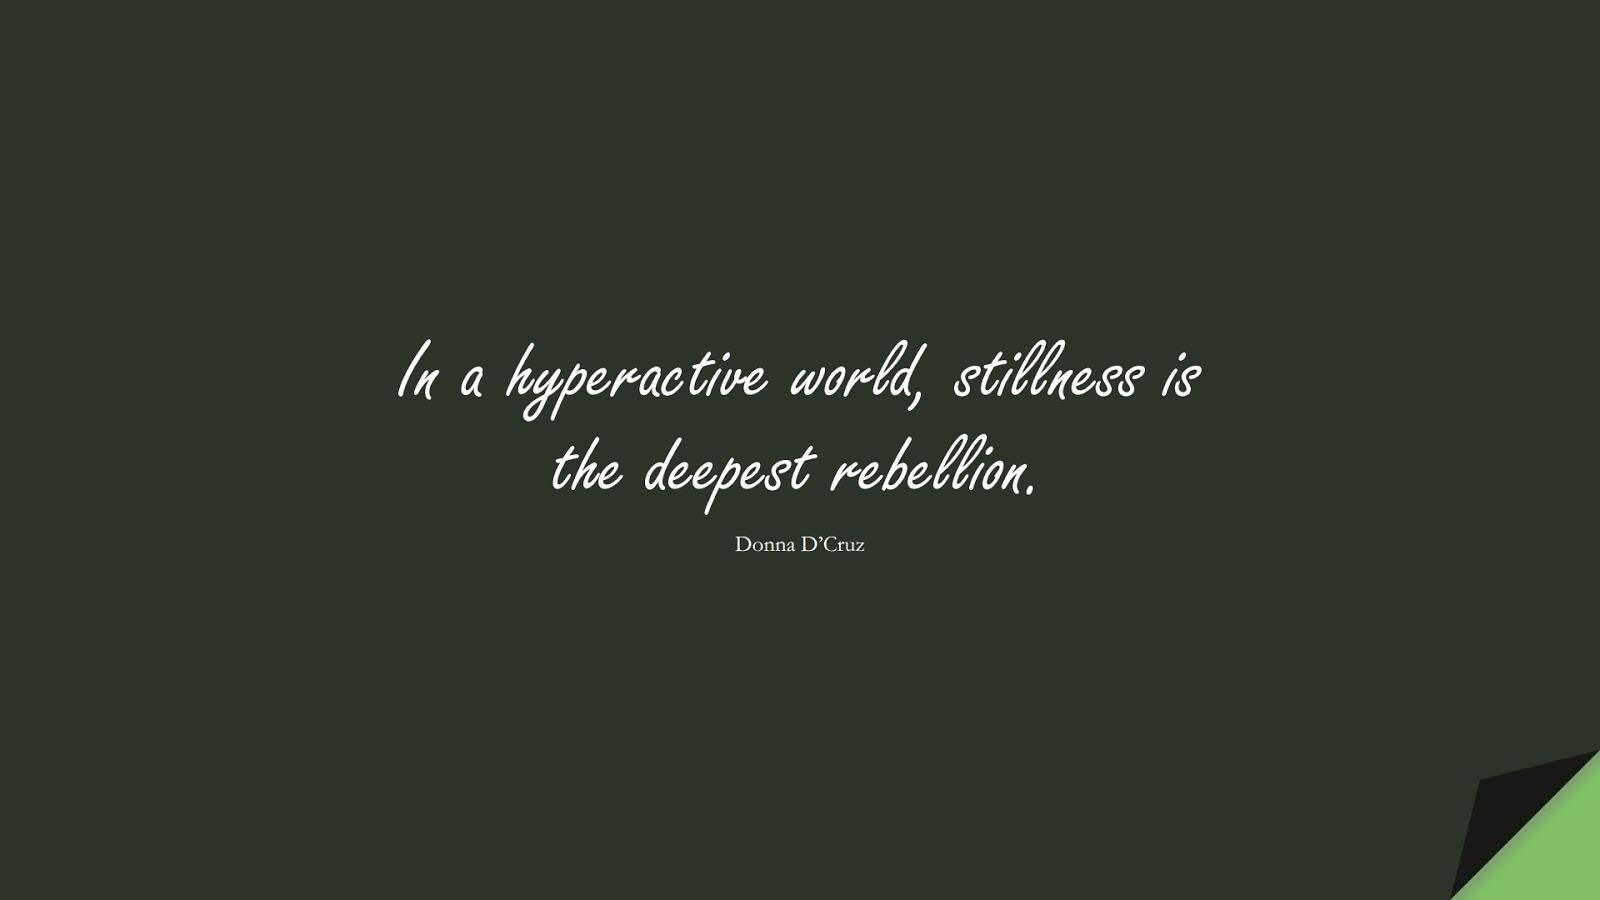 In a hyperactive world, stillness is the deepest rebellion. (Donna D'Cruz);  #CalmQuotes